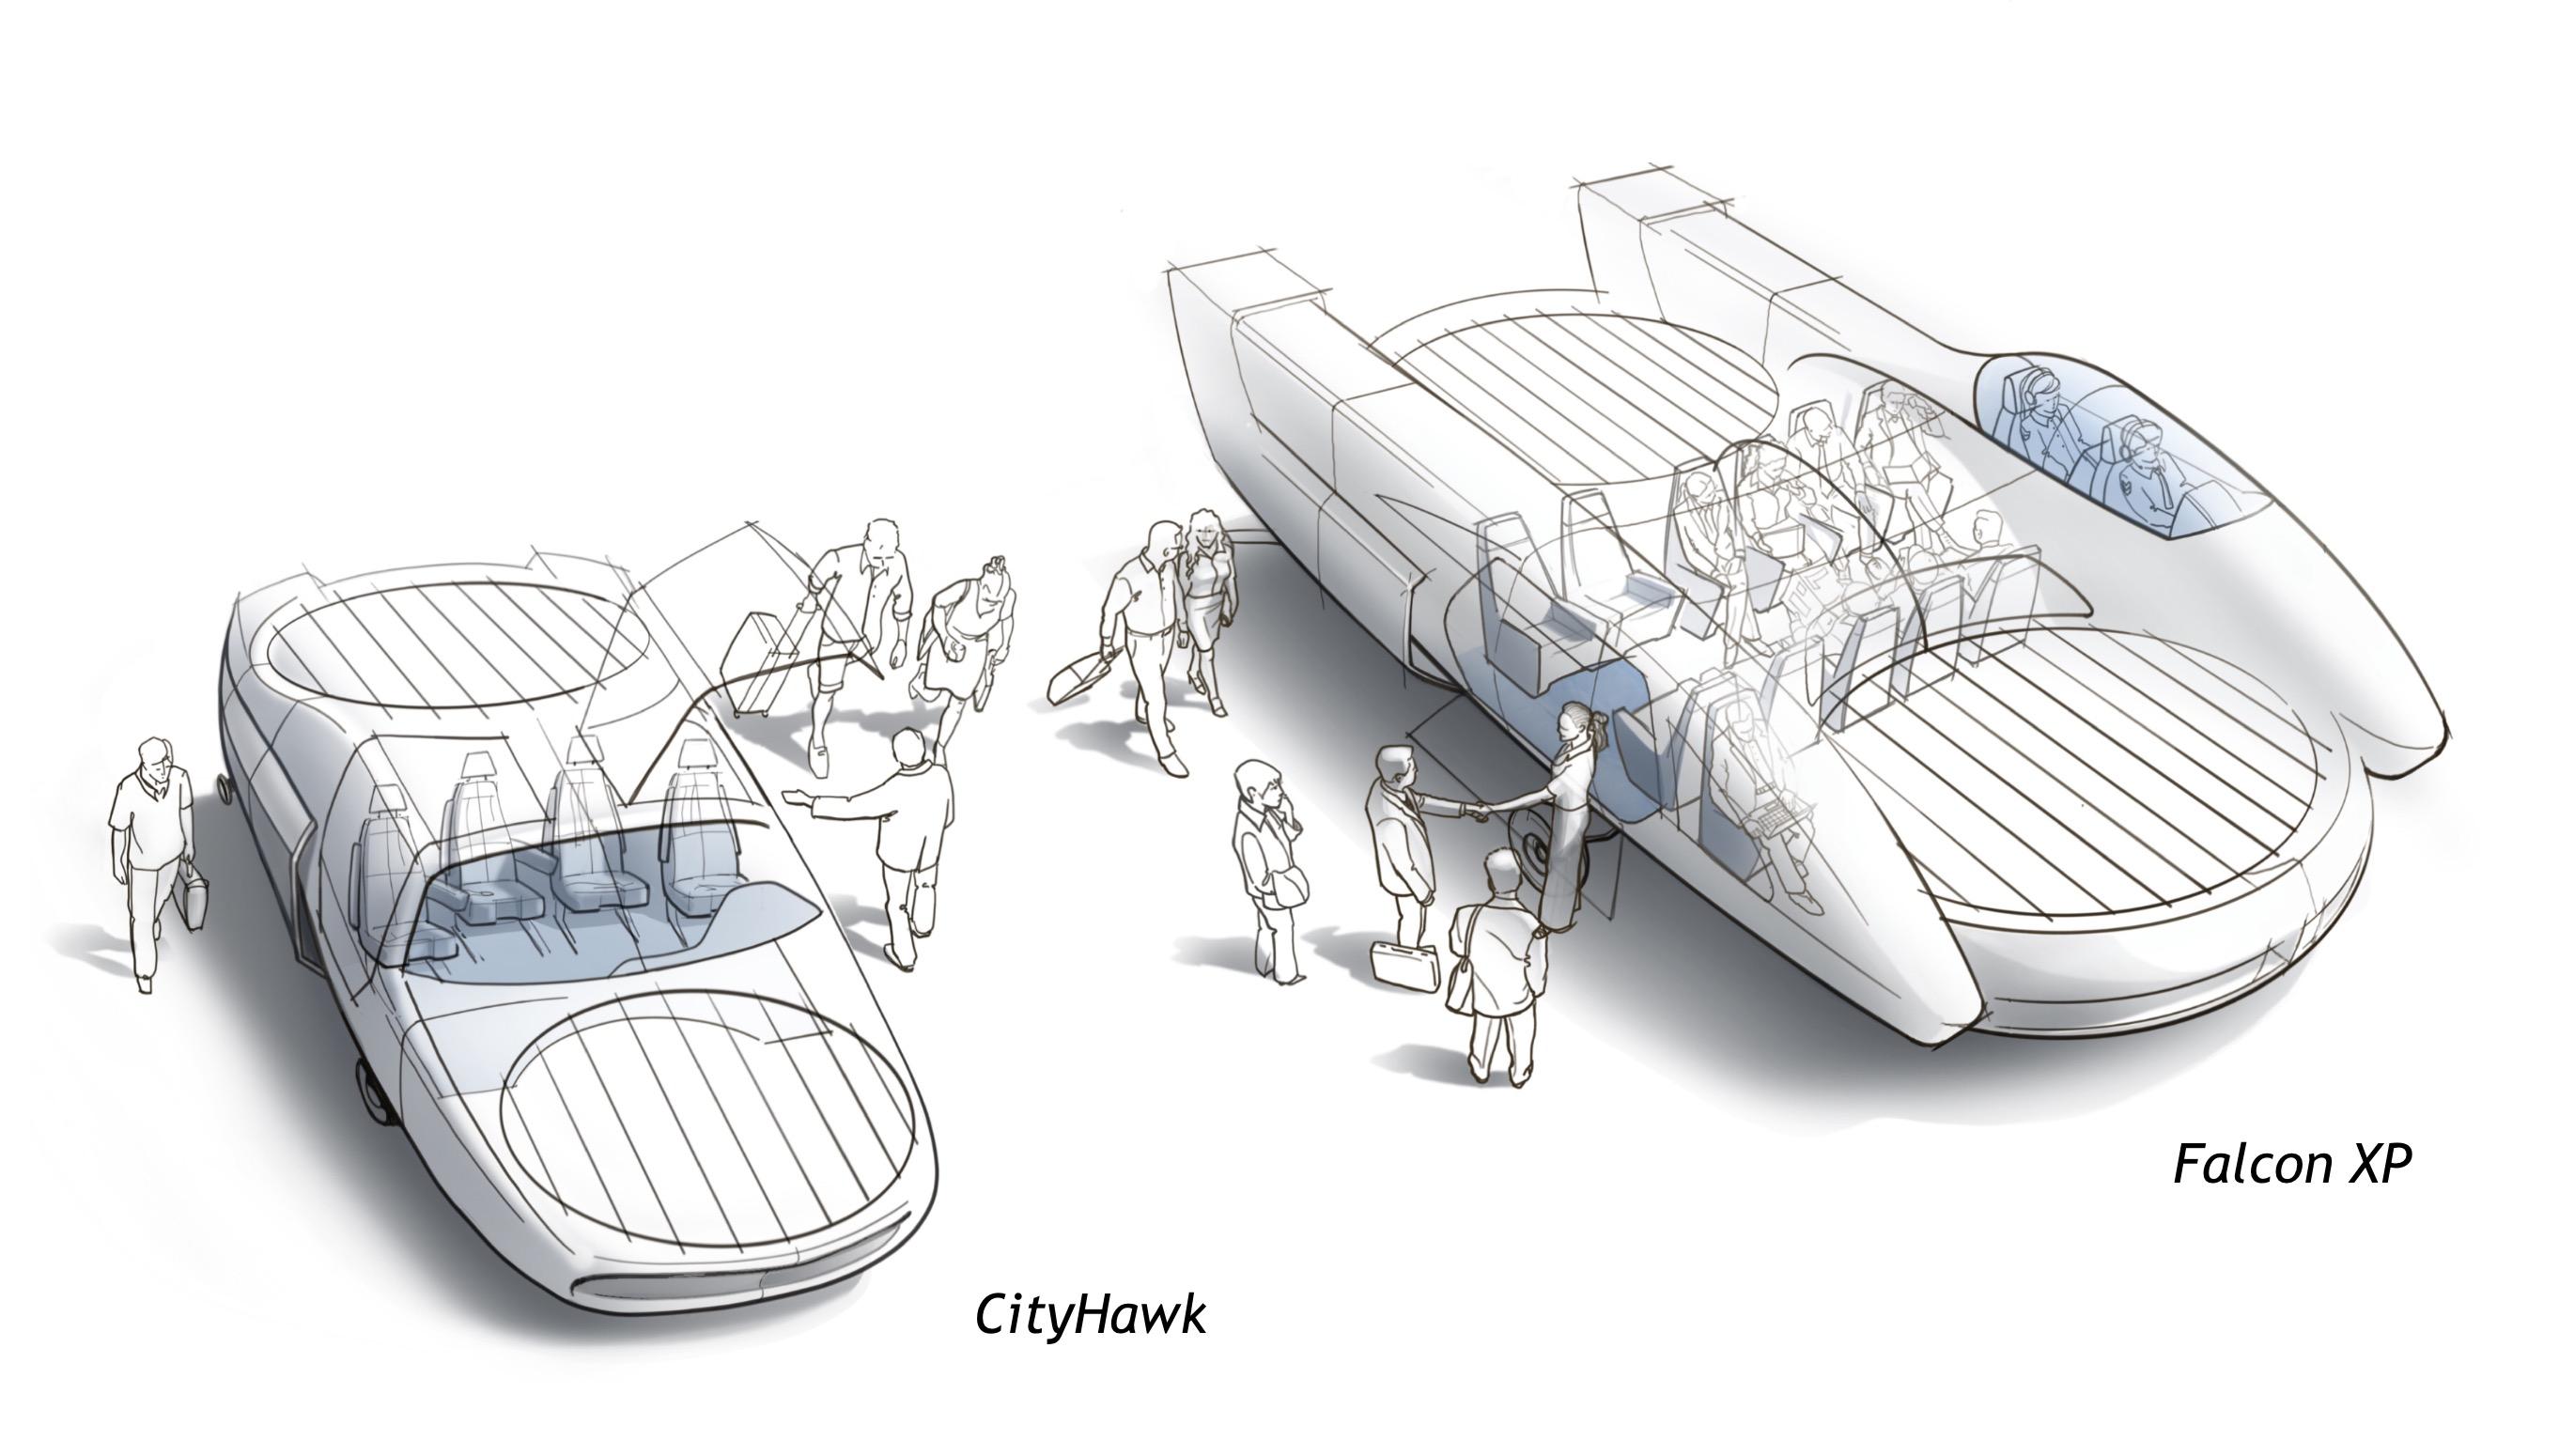 Civil_CityHawk-Falcon-XP_Photo-Dec-07-6-23-50-AM_Photo-Urban-Aeronautics.jpg